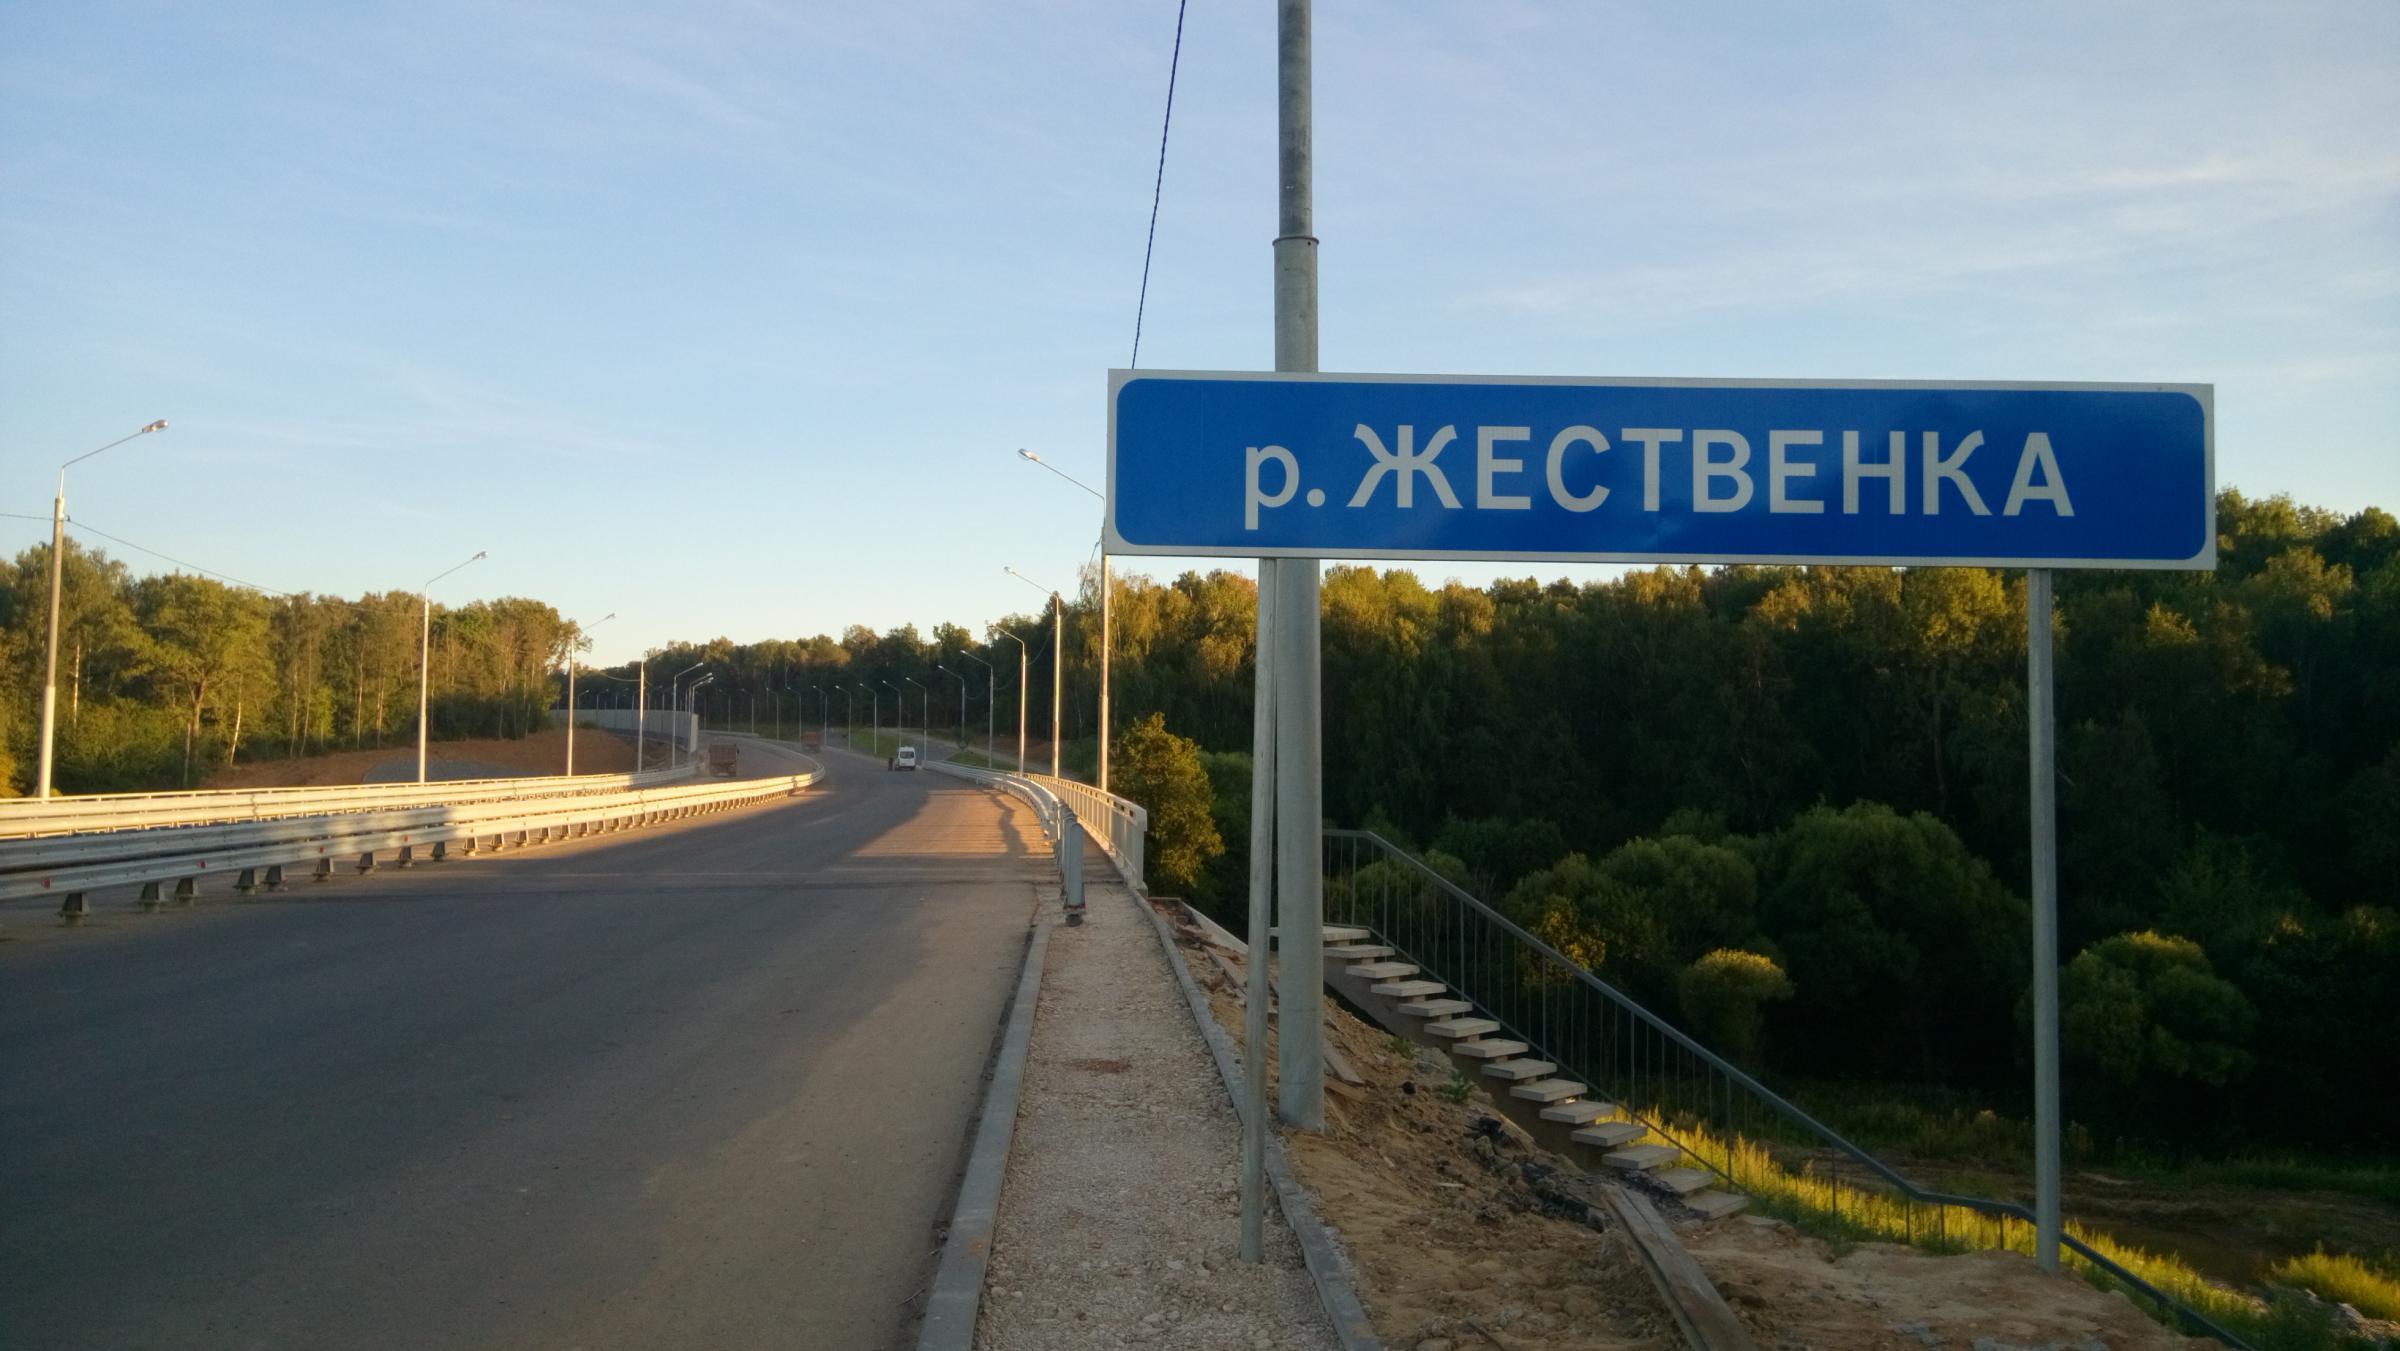 Мост через реку Жественку